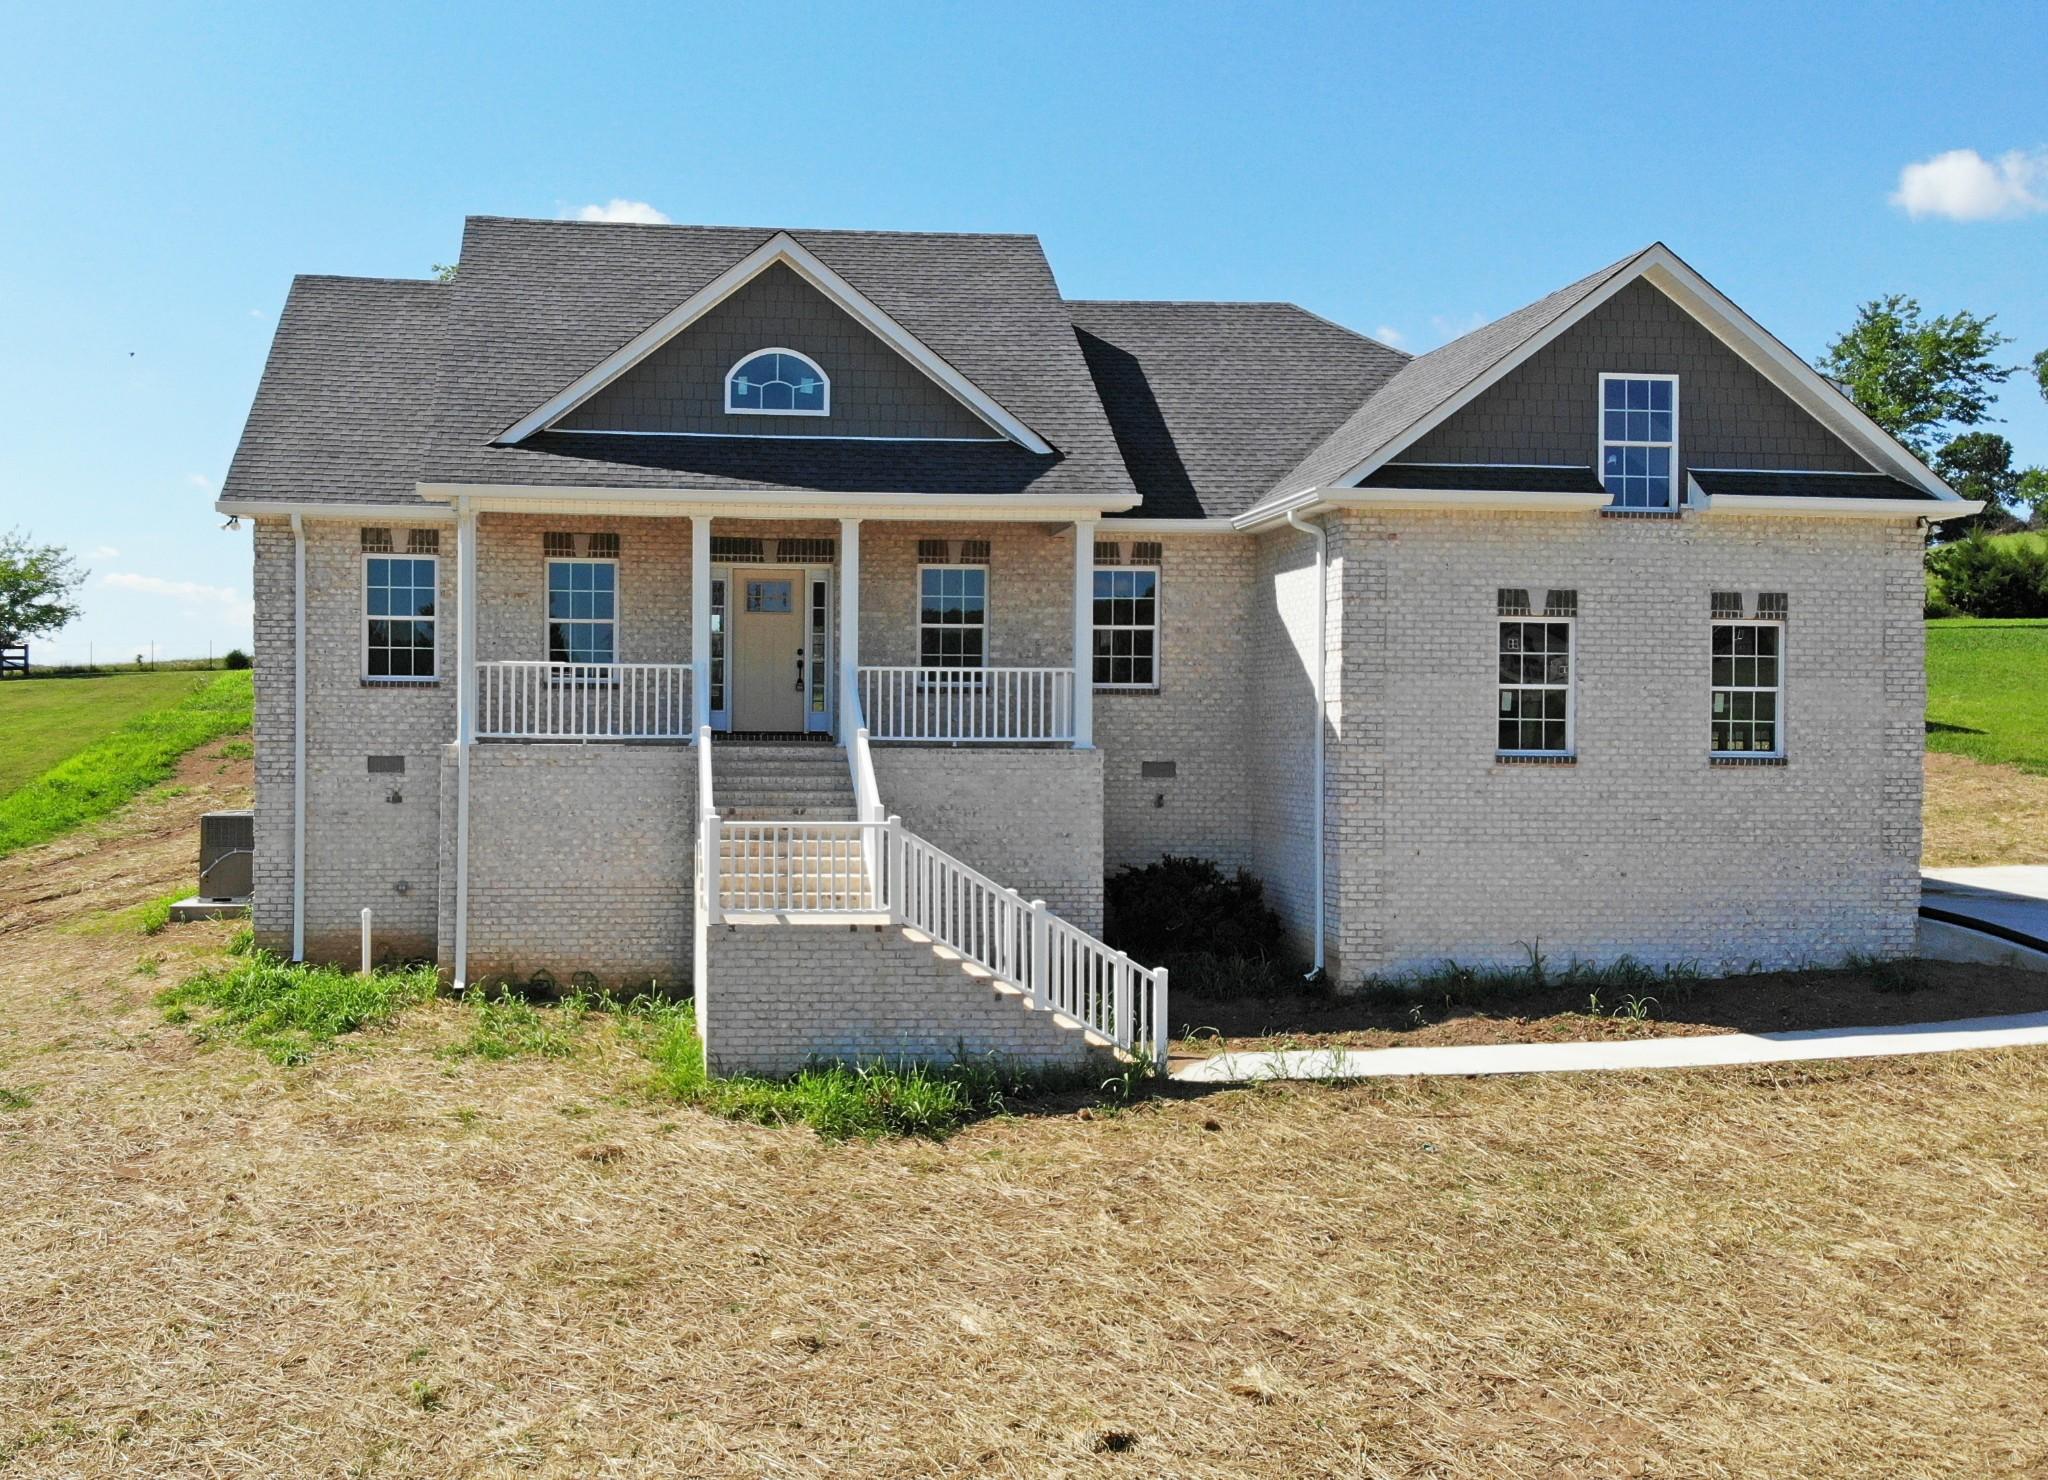 145 Bridle Path Ln, Hartsville, TN 37074 - Hartsville, TN real estate listing